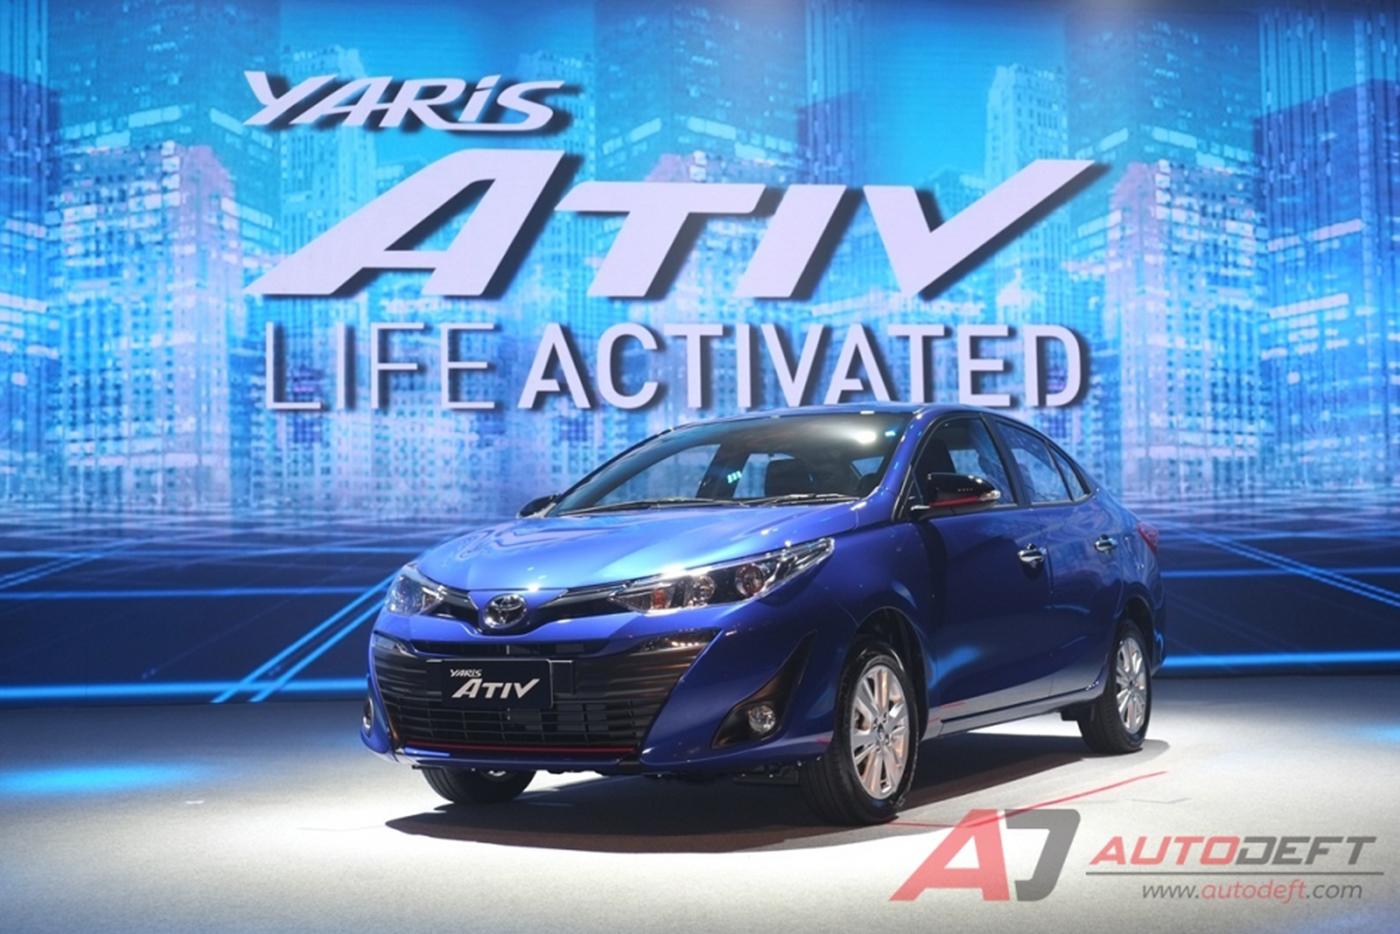 toyota-yaris-sedan-2018-26.jpg